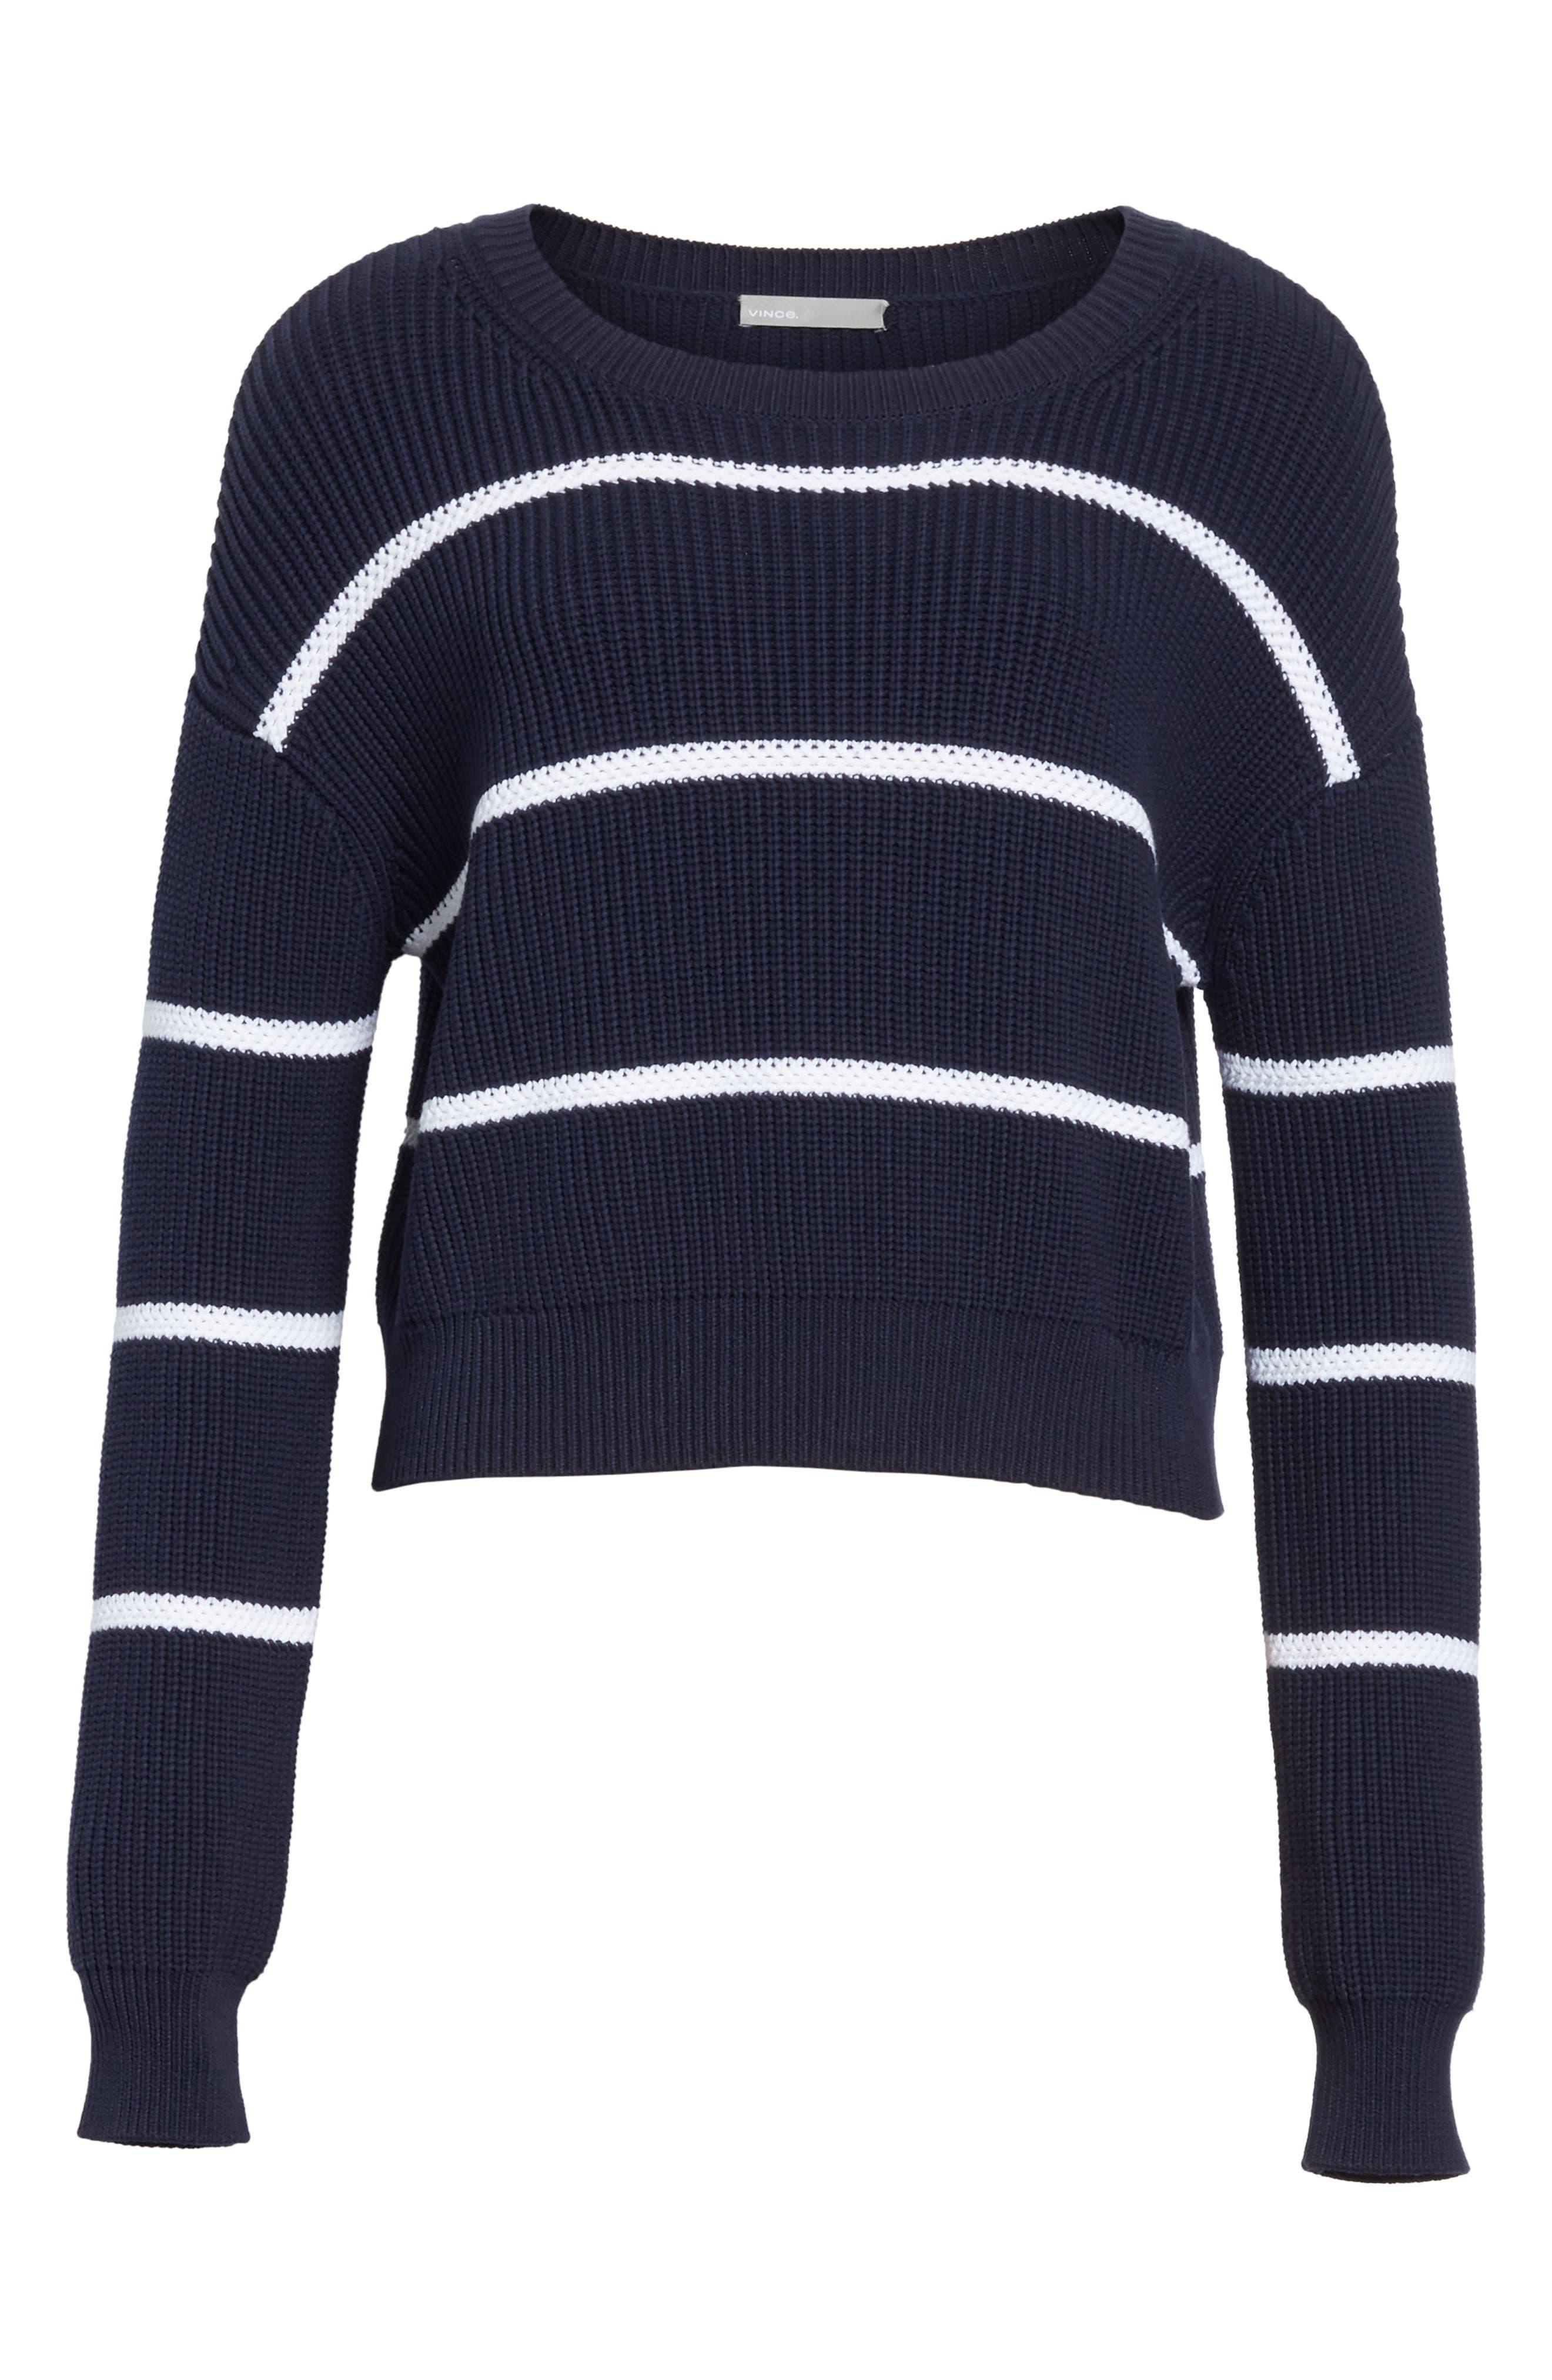 Cotton Blend Rib Knit Stripe Sweater,                             Alternate thumbnail 12, color,